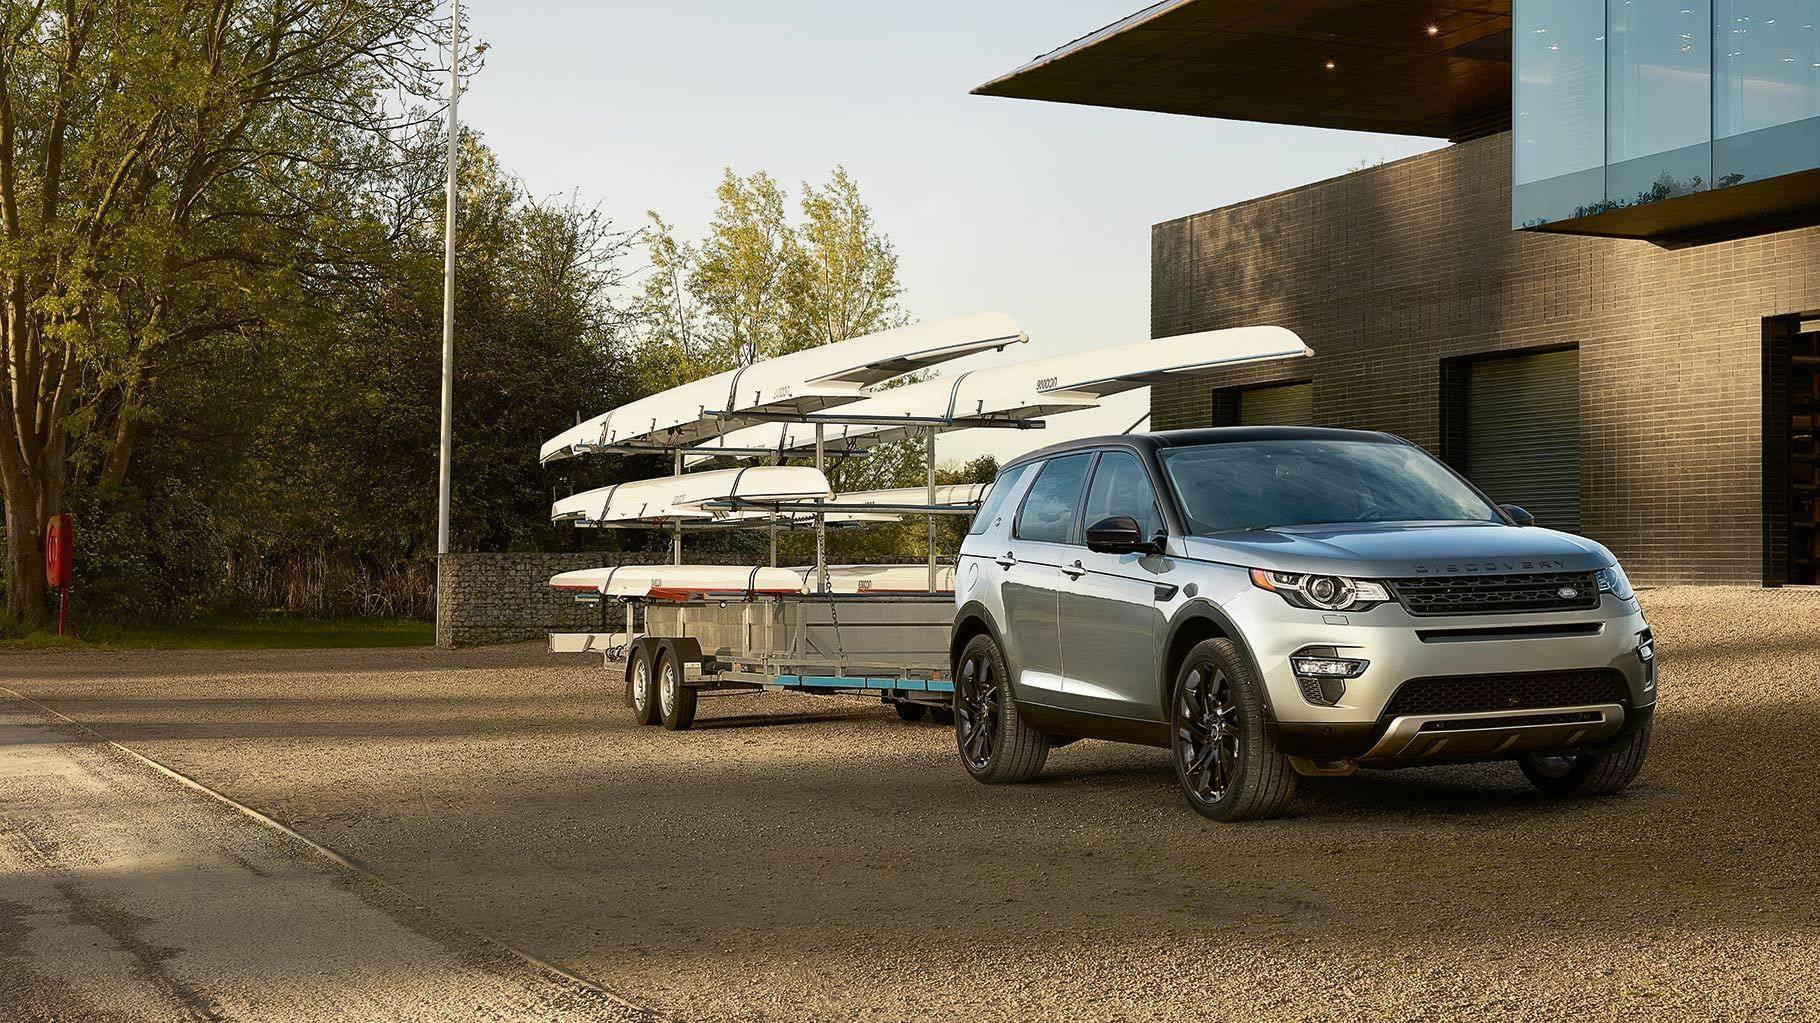 Land Rover Discovery Sport Exterior